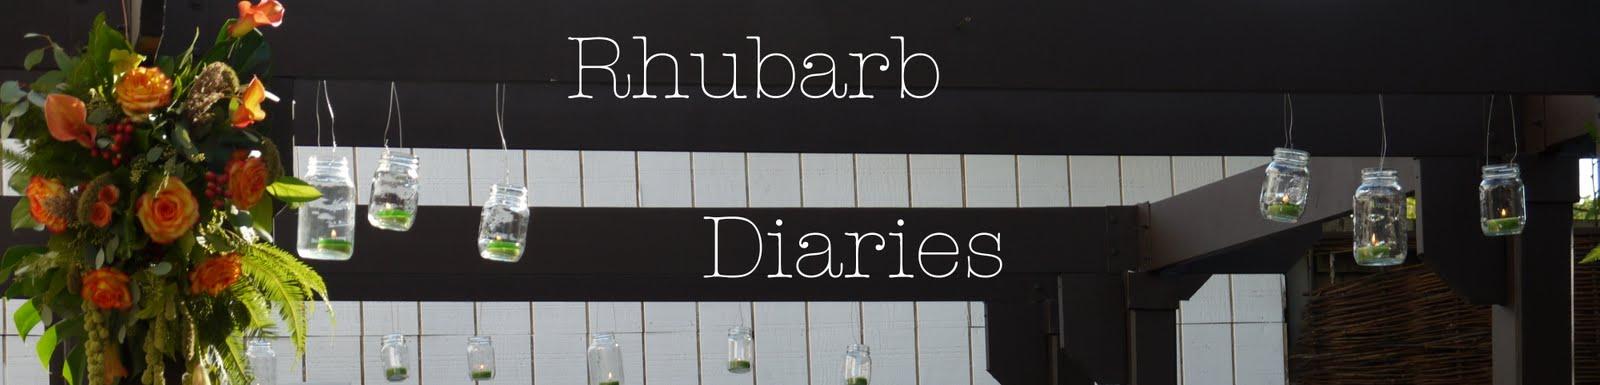 Rhubarb Diaries